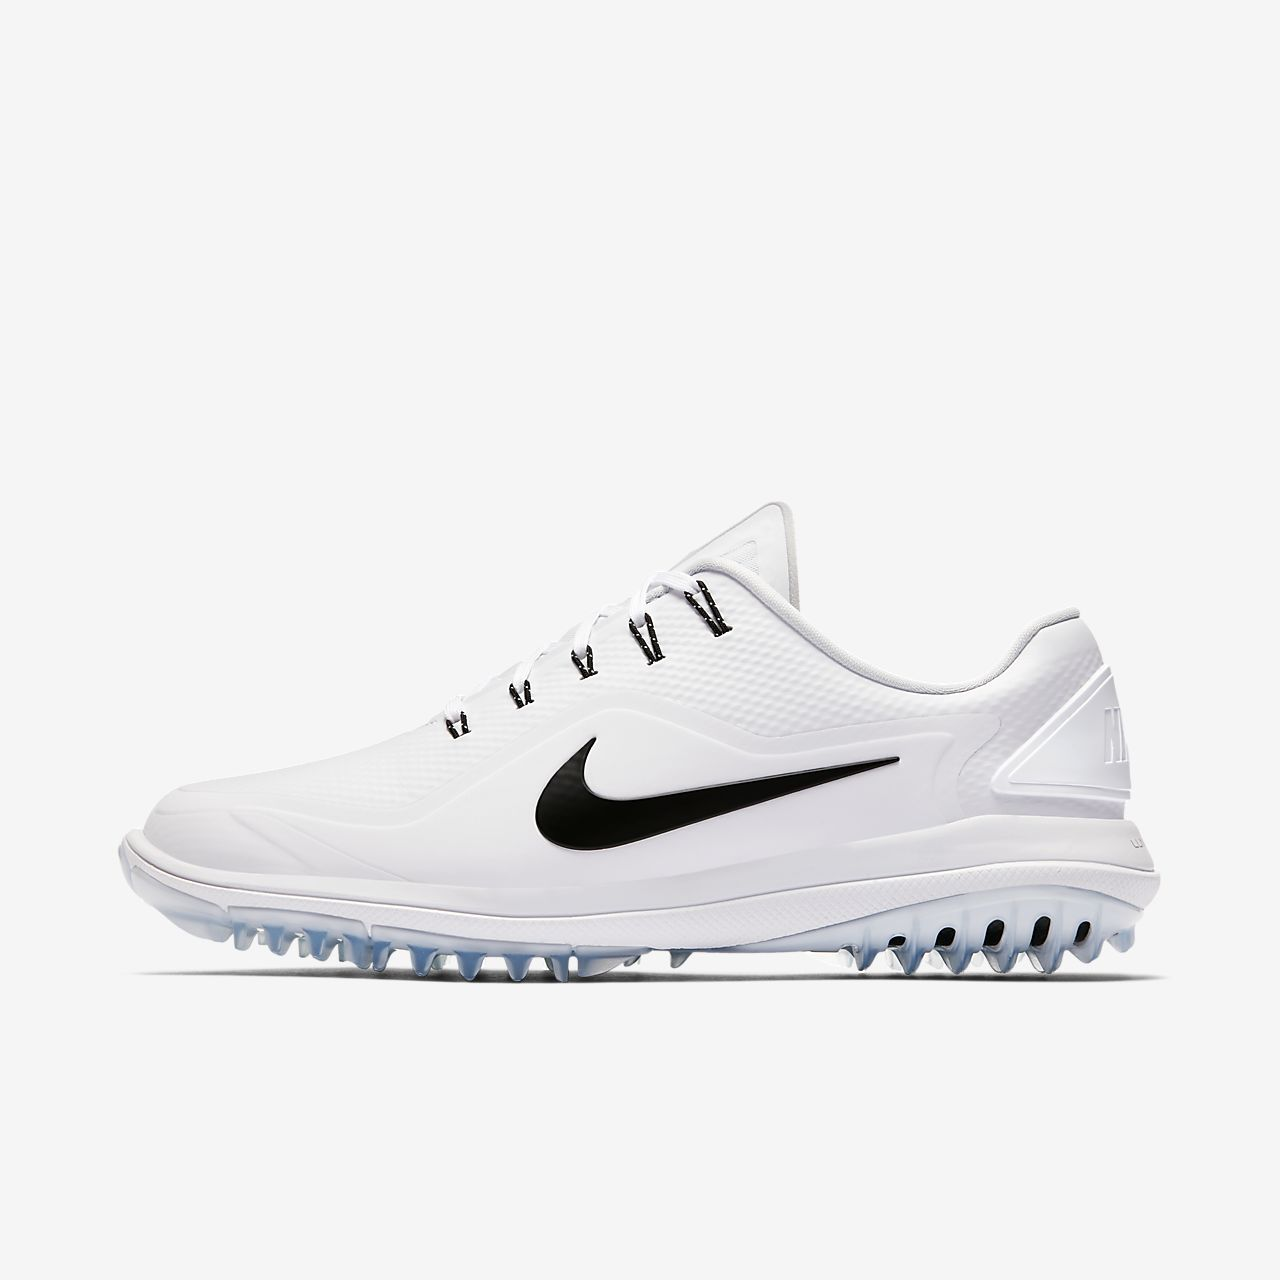 Nike Lunar Command - Zapatillas de Golf para Hombre, Color Blanco/Gris/Negro, Talla 43